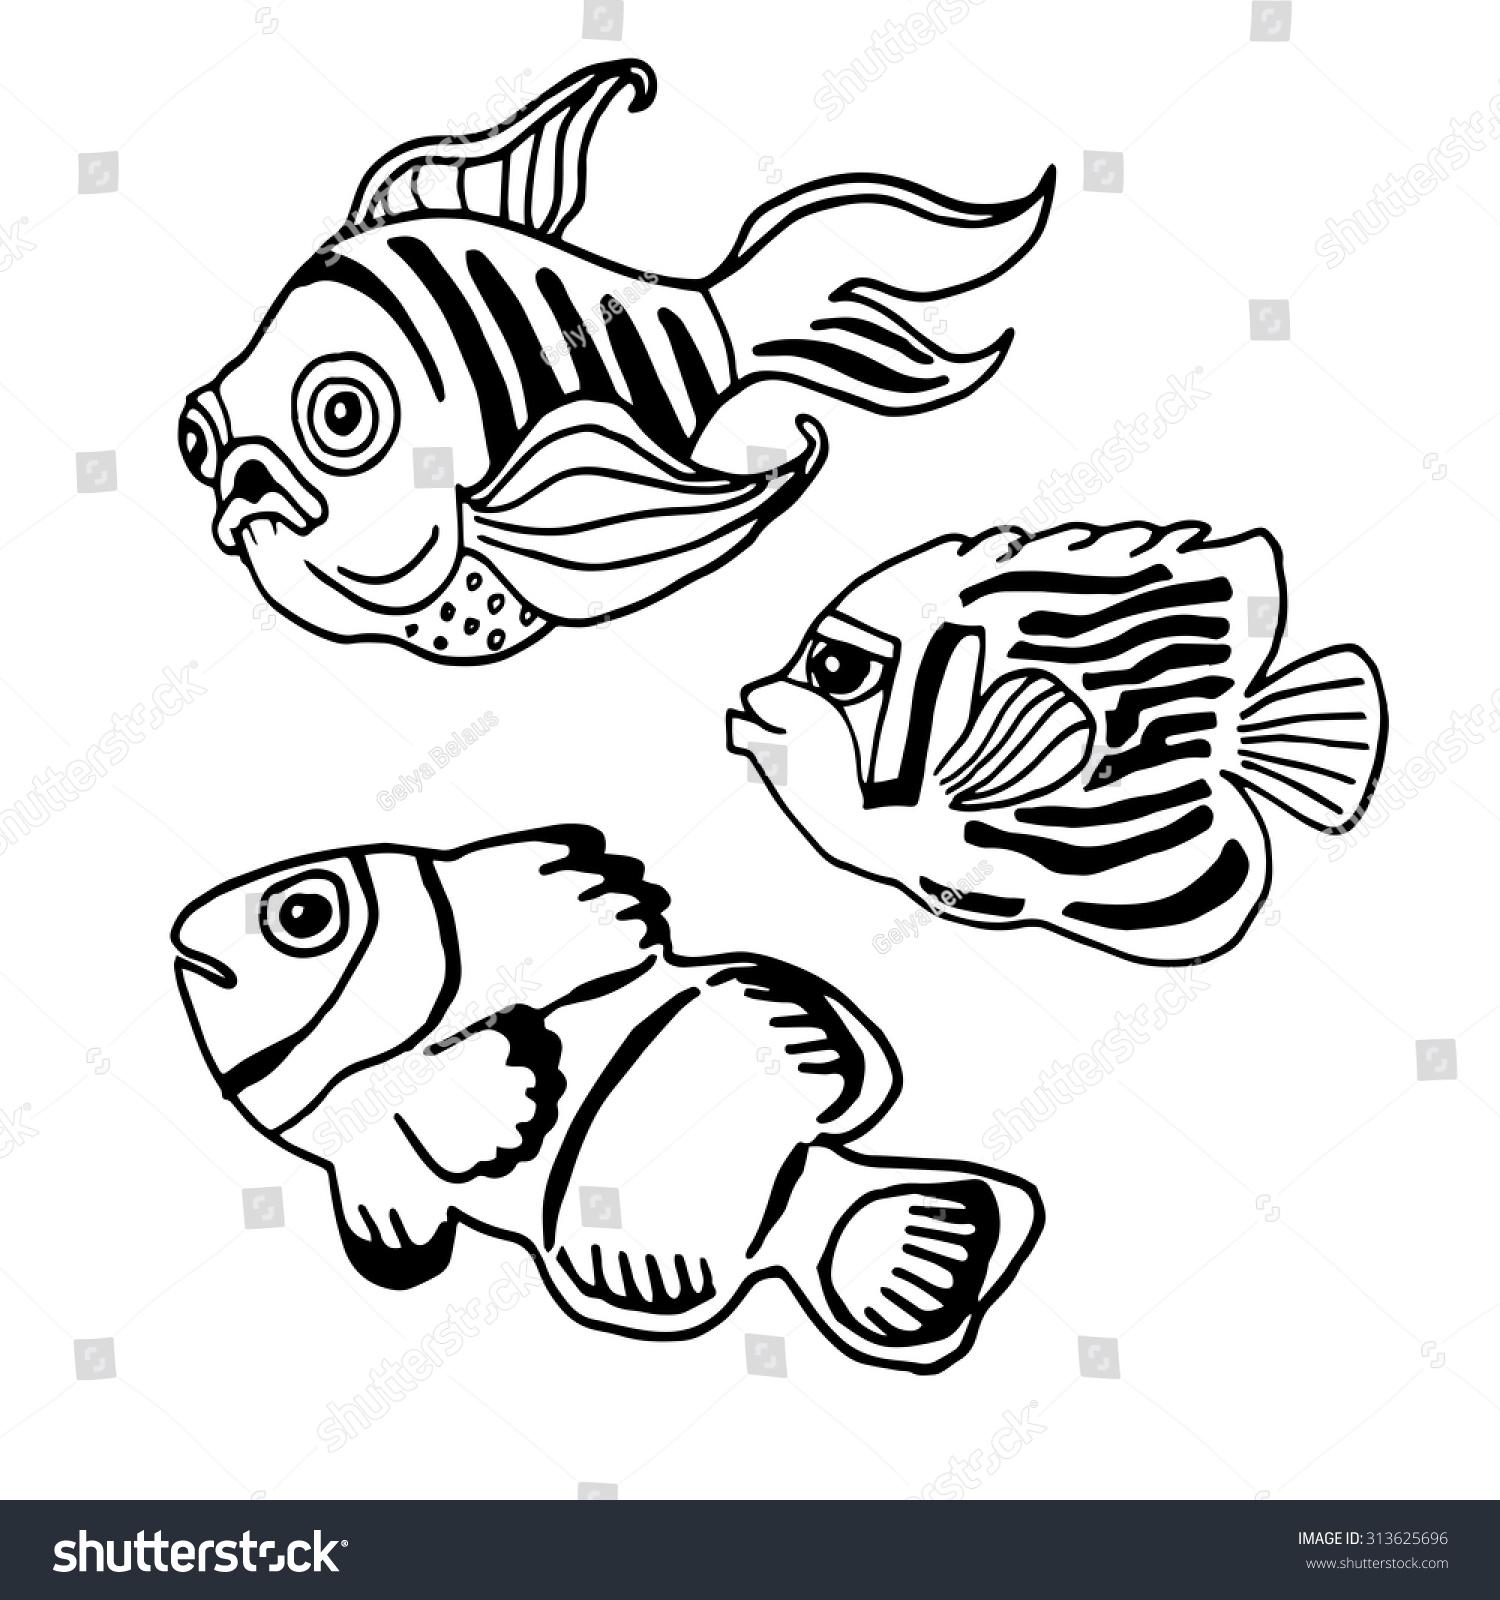 Coloring Book Fish Hand Drawn Vector